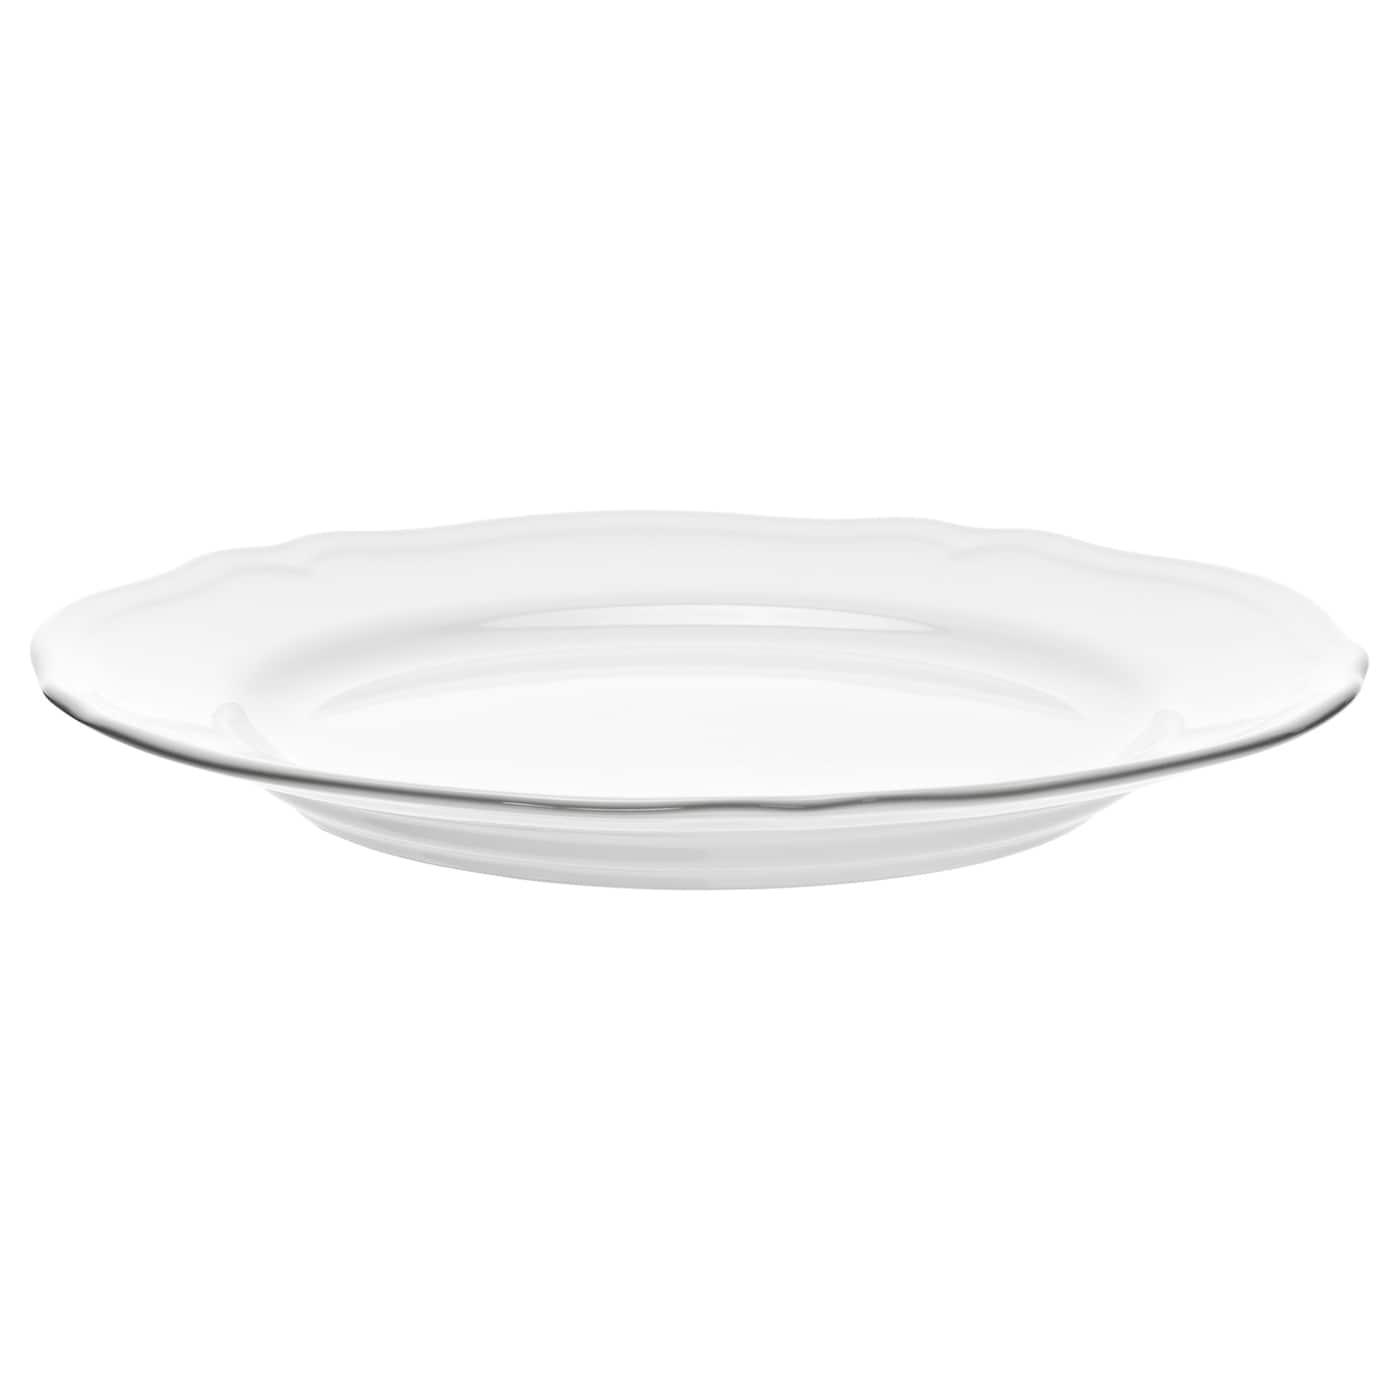 196 Tbart 24 Piece Cutlery Set Stainless Steel Ikea